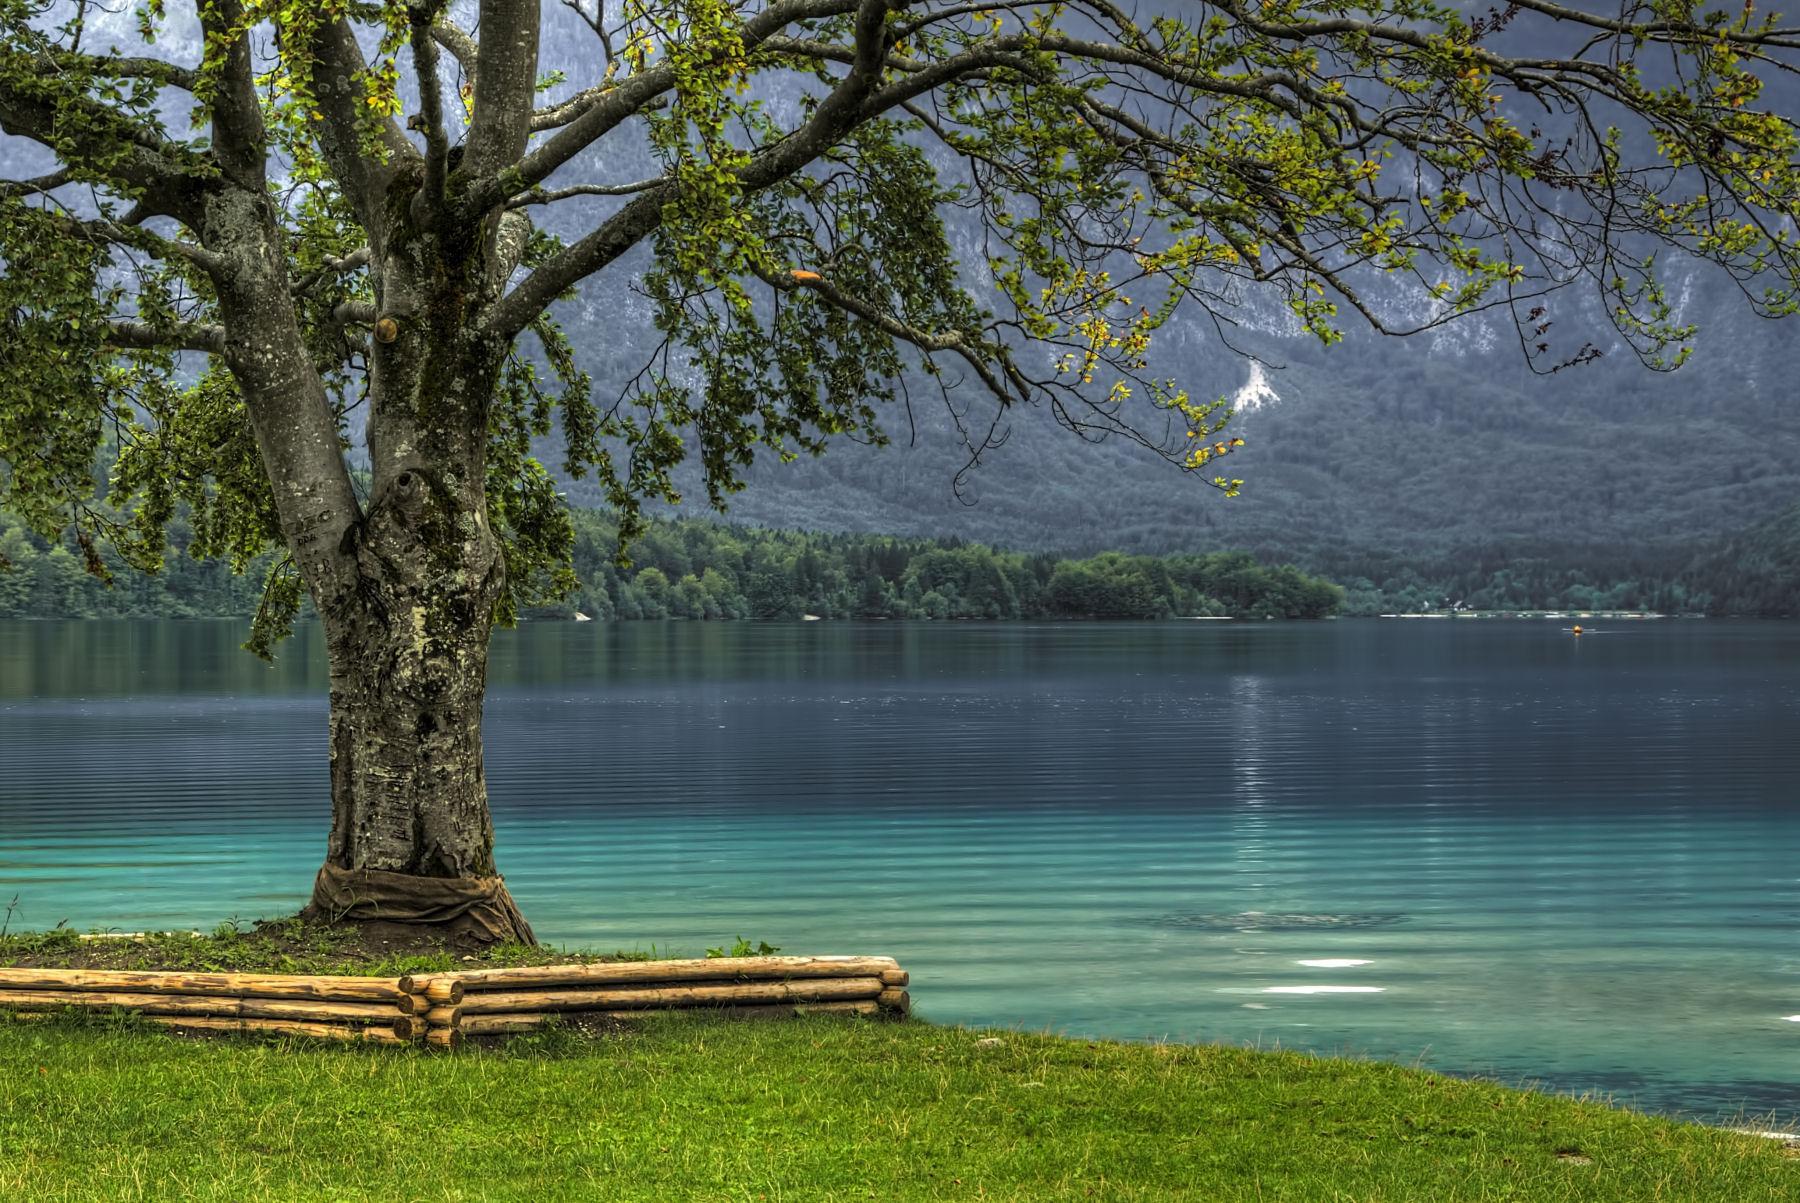 lake-bohinj-slovenia